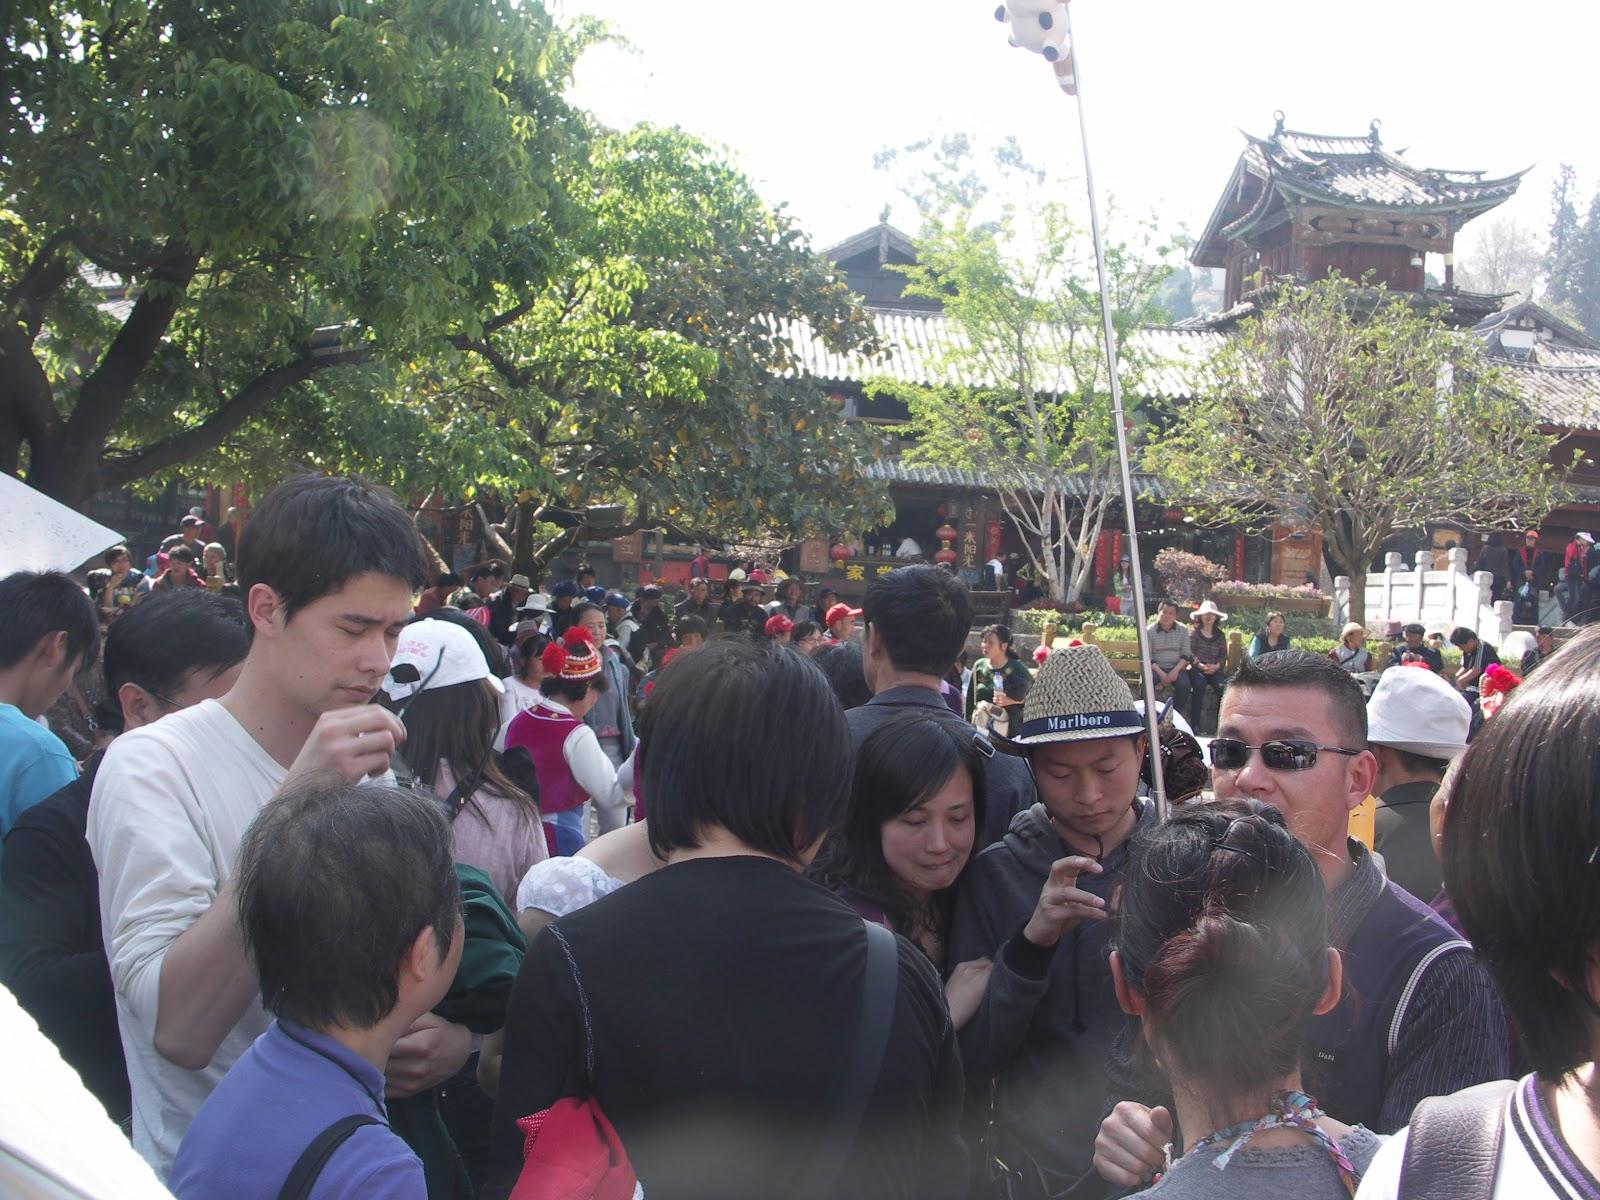 http://2.bp.blogspot.com/-qkSC7d-AdMg/Tawk791SuWI/AAAAAAAABCs/iluzfwkkaCs/s1600/Yunnan+Sechzuan+April106.JPG